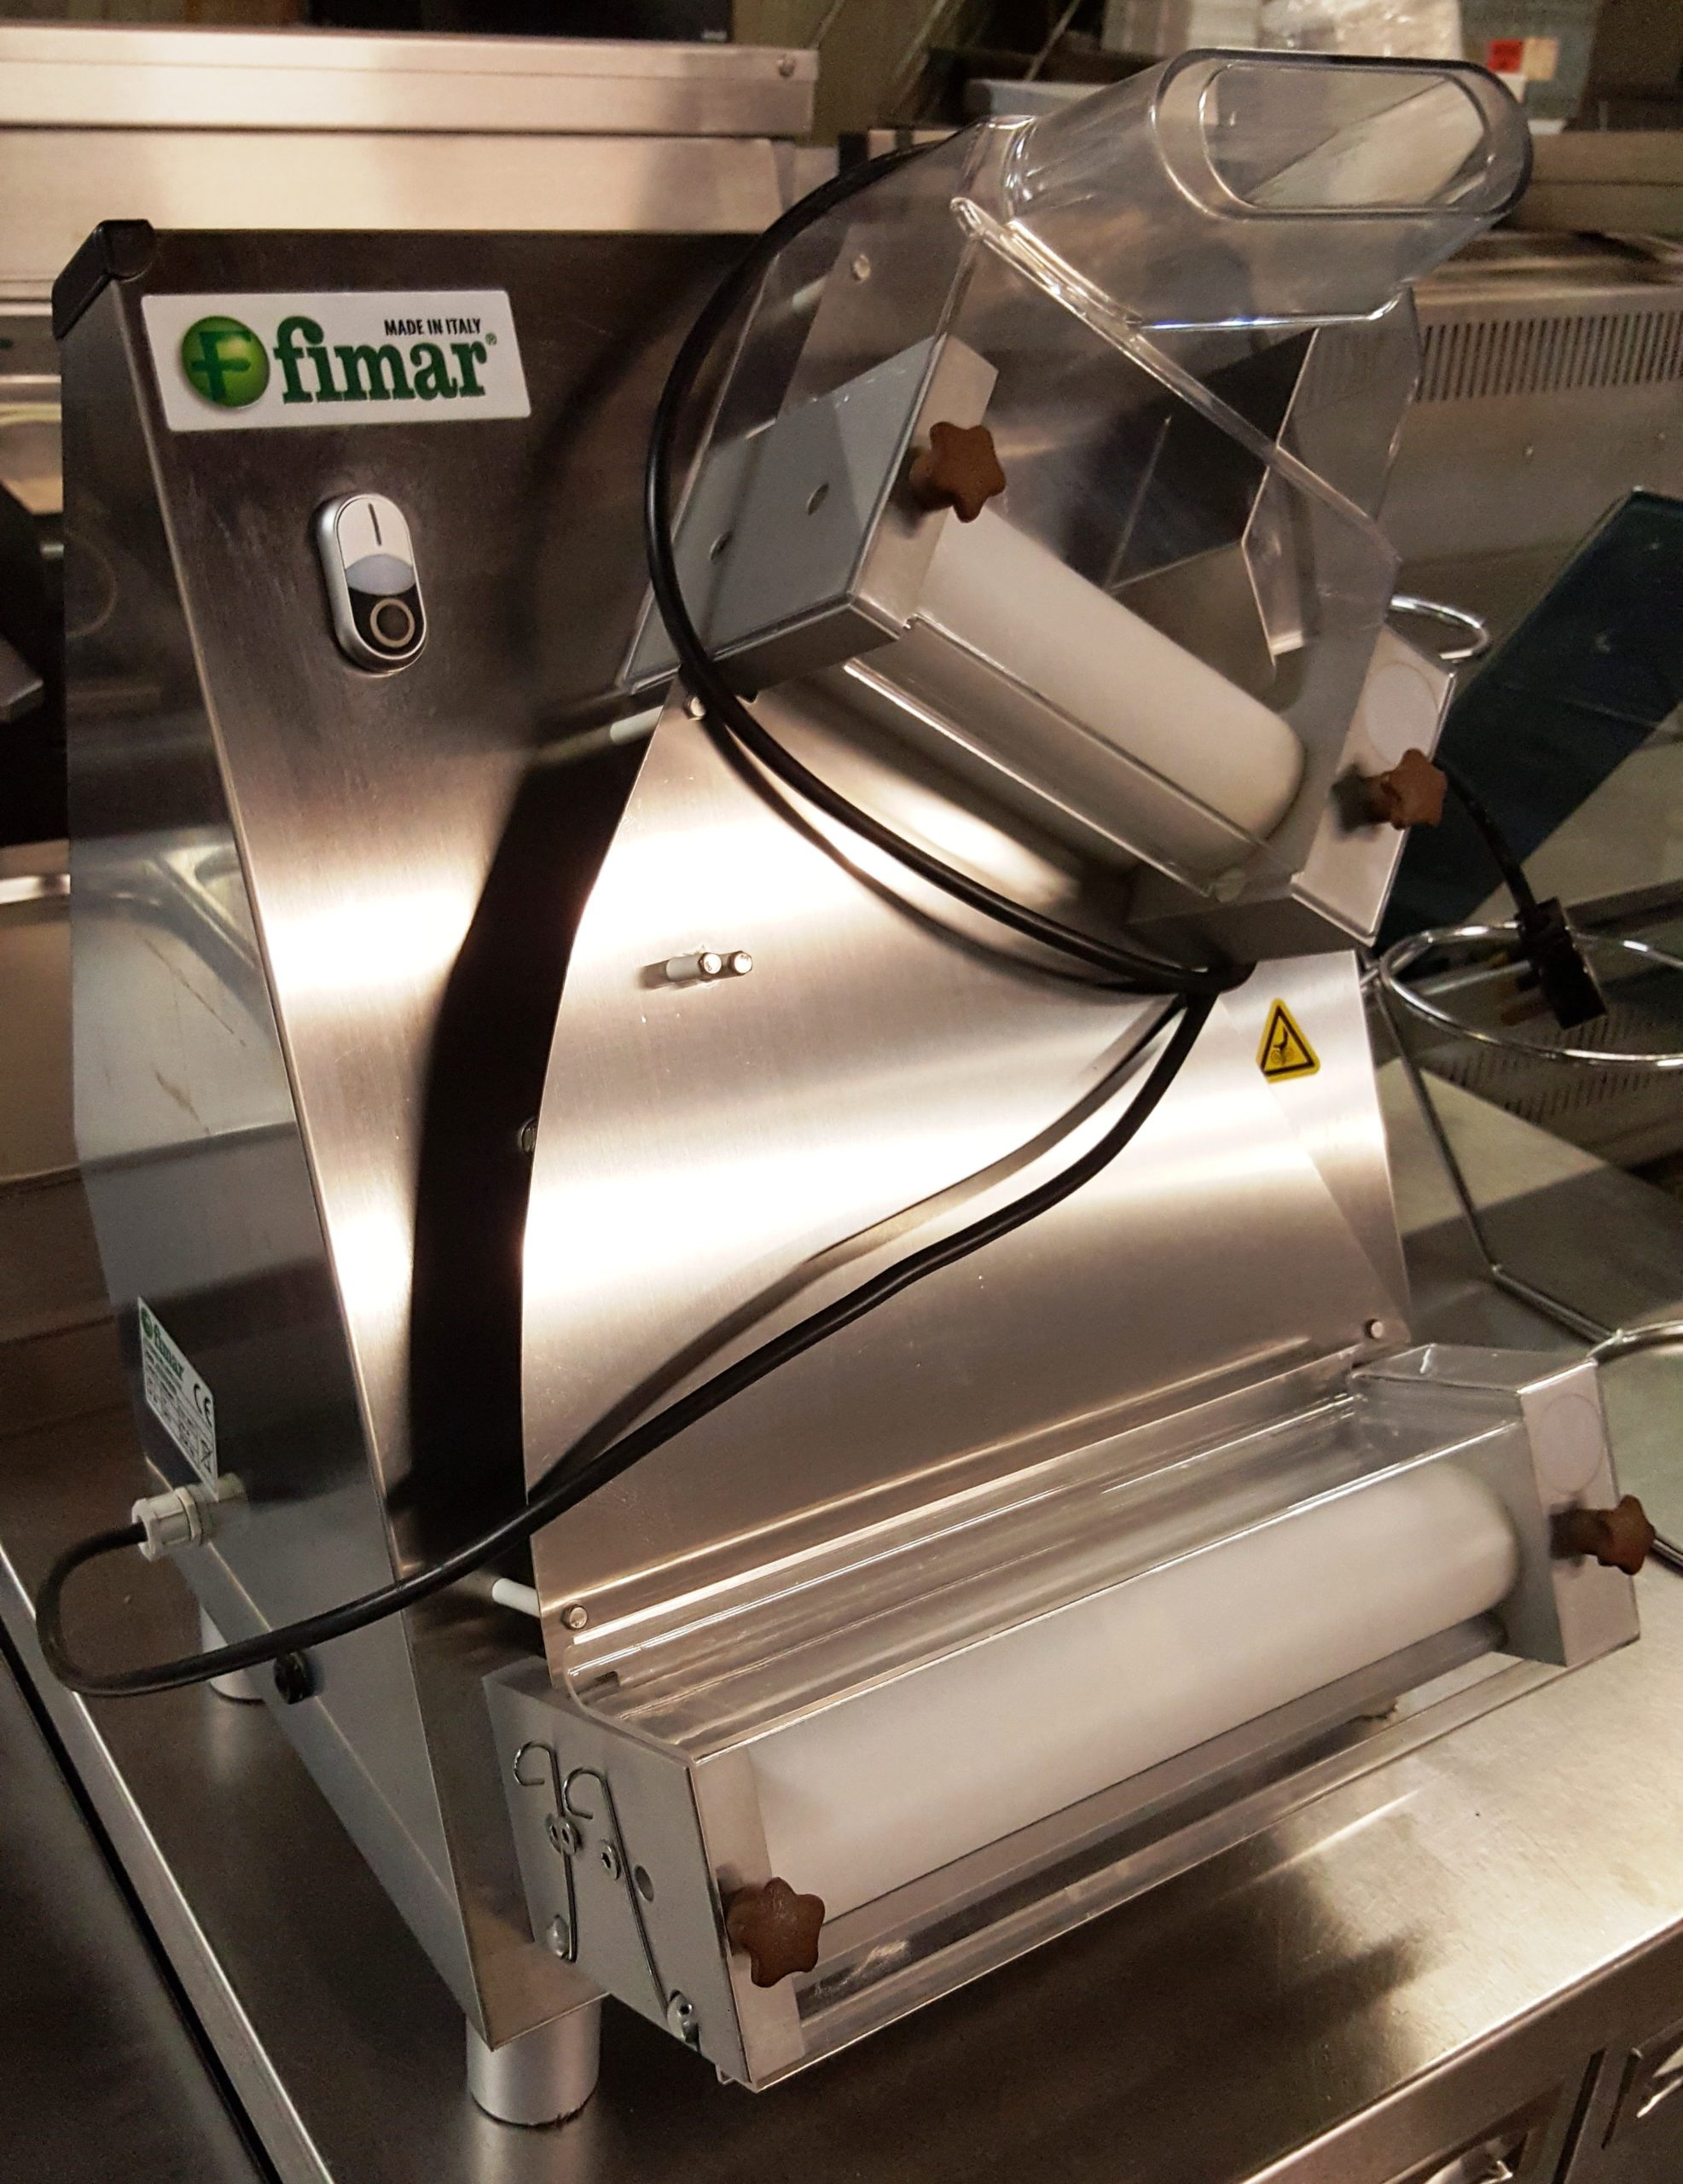 FIMAR 12 inch Pizza Dough Roller – Ex Demonstrator!